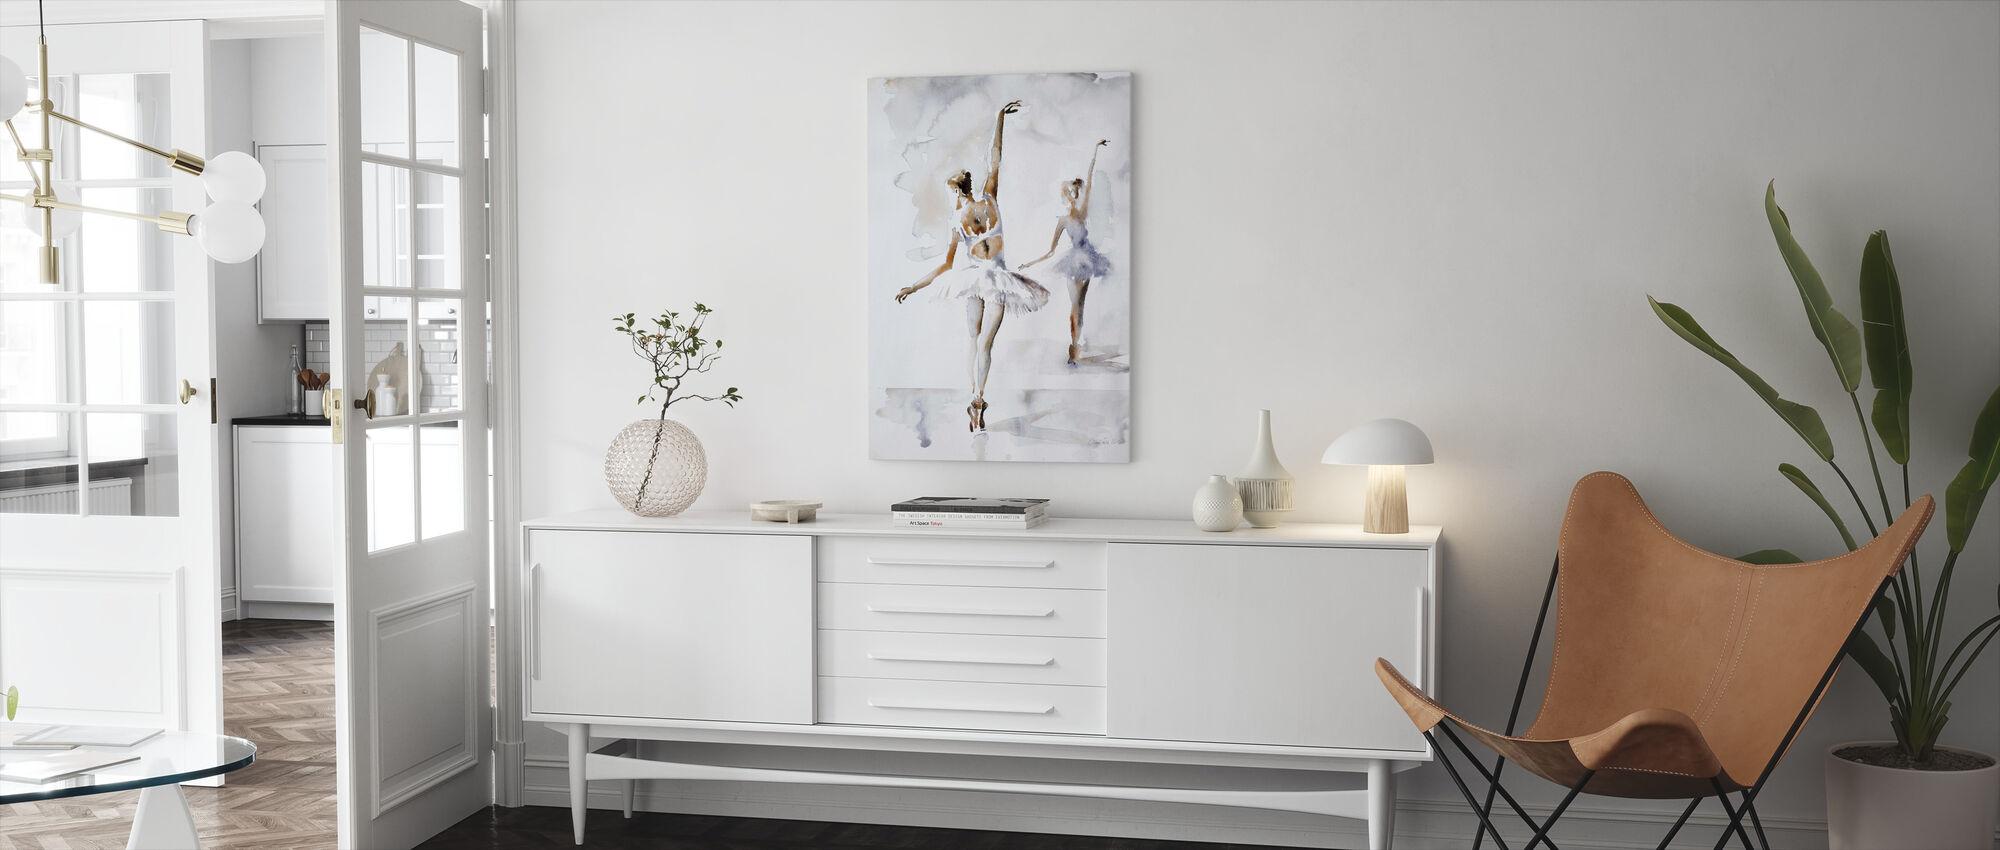 Ballerina In Blue - Canvas print - Living Room